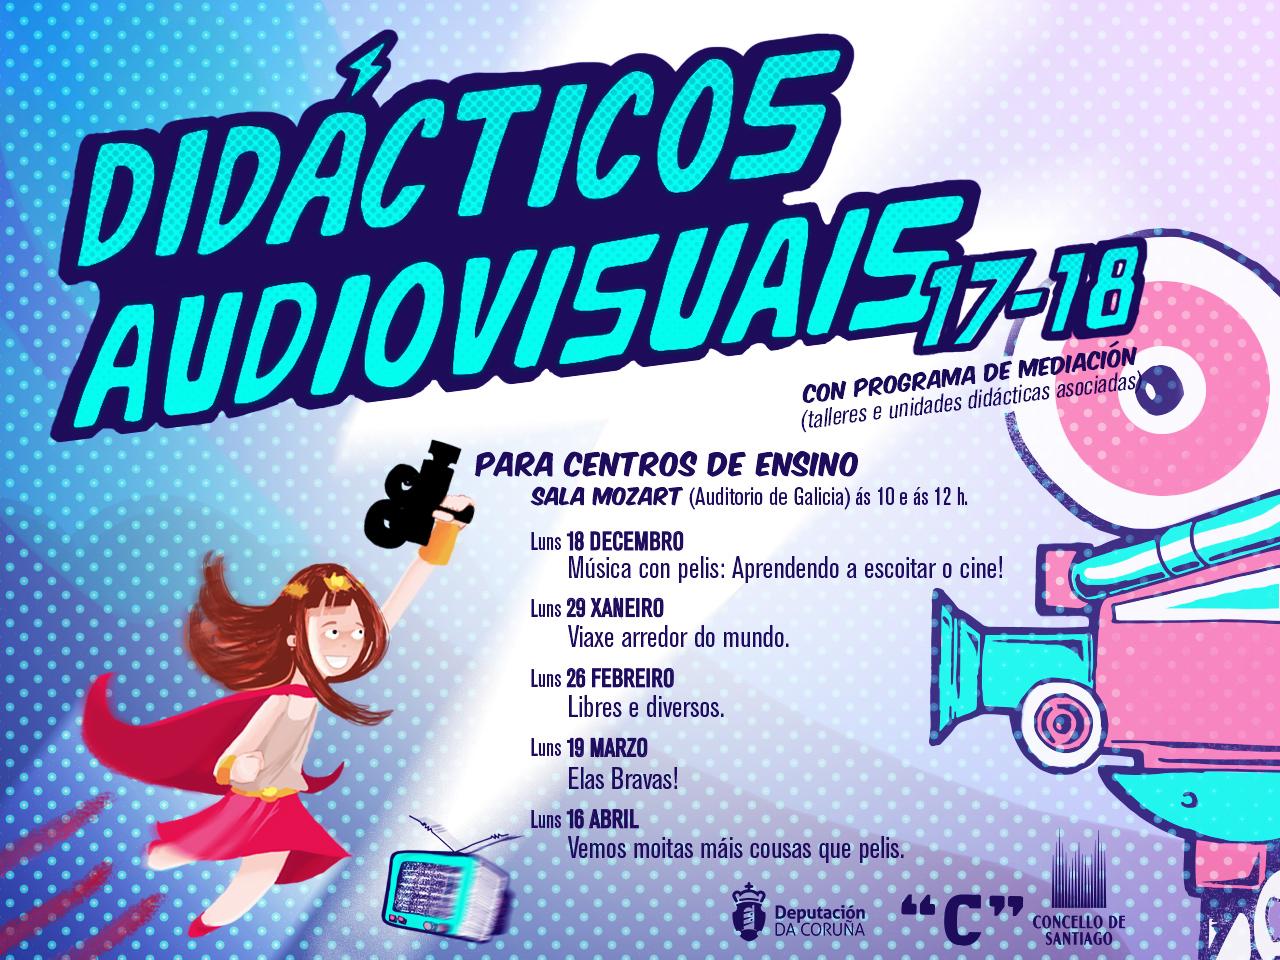 didacticos_audiovisuais_17_19